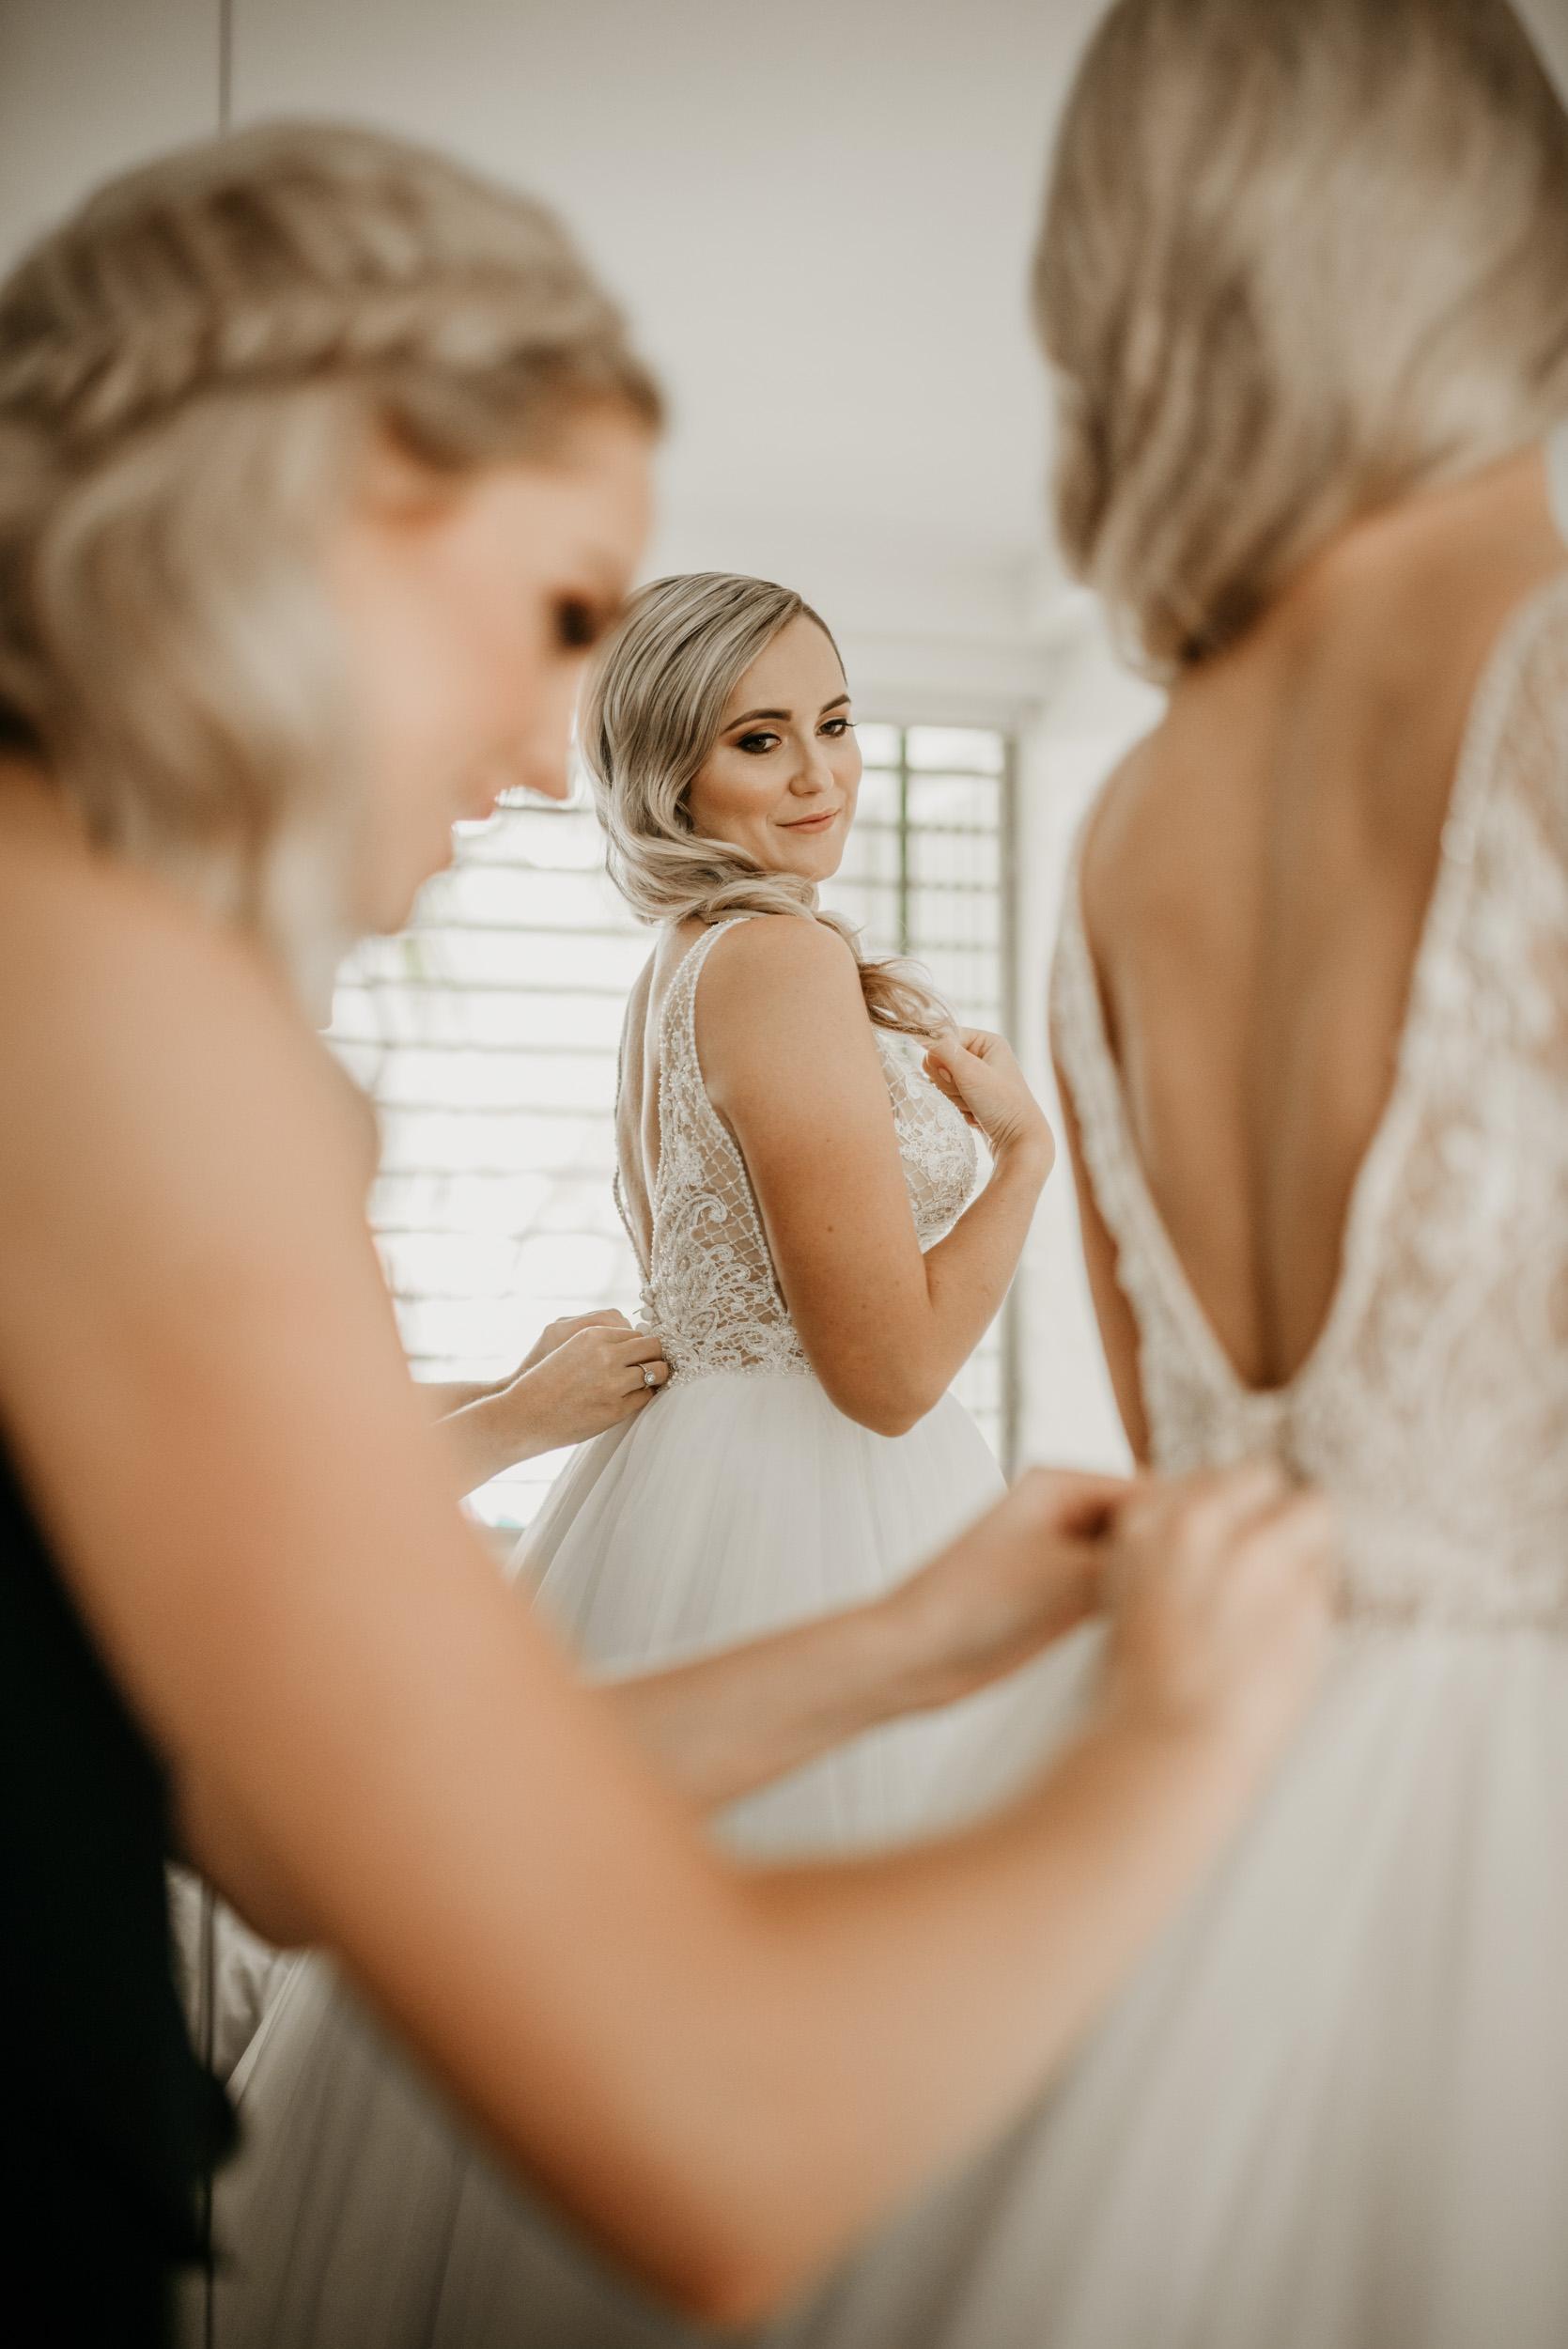 The Raw Photographer - Cairns and Port Douglas Wedding Photographer - Best of 2018-9.jpg